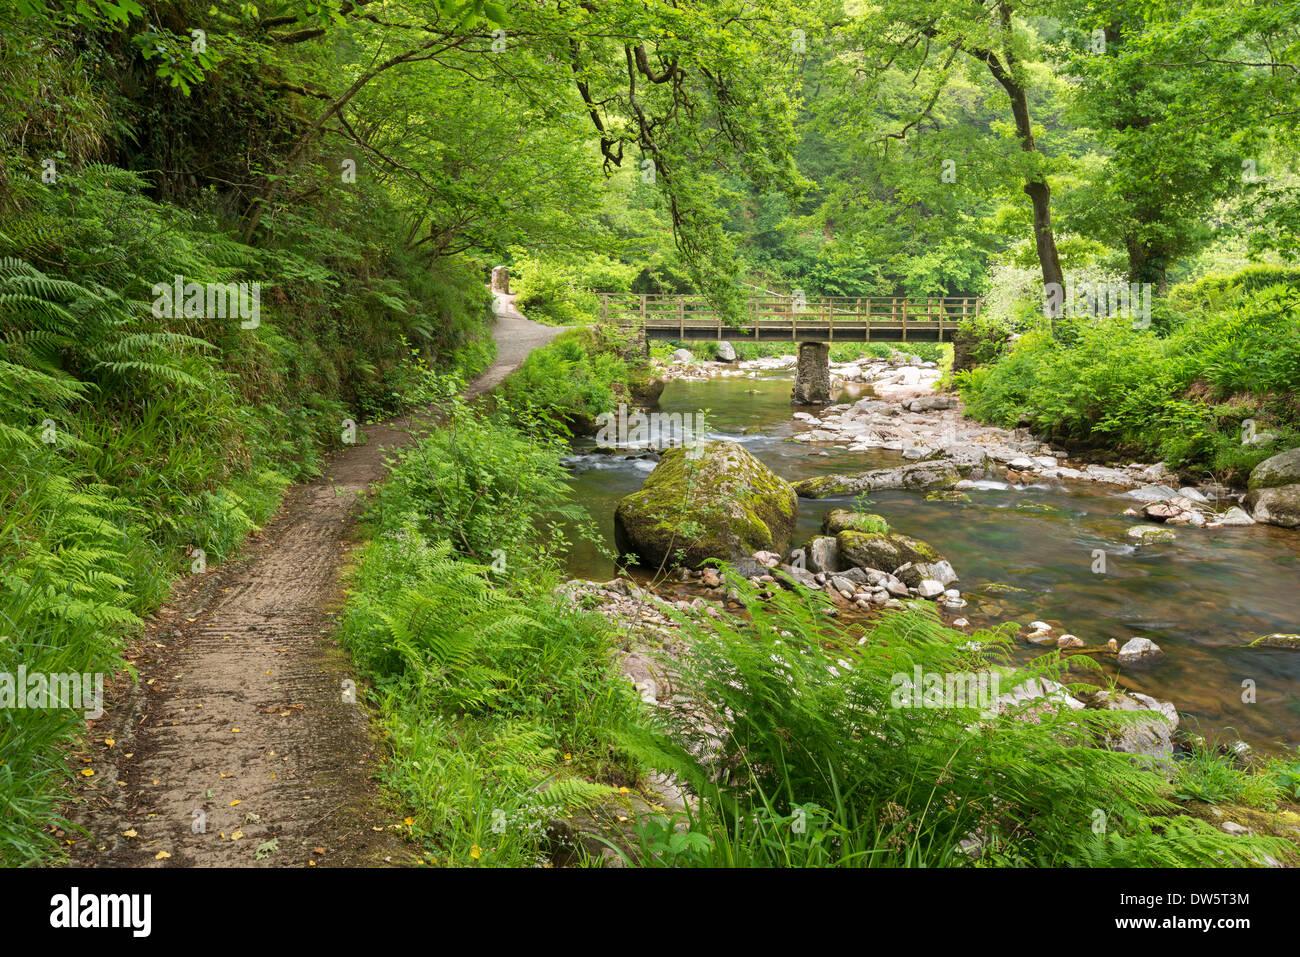 East Lyn River at Watersmeet, Exmoor National Park, Devon, England. Summer (June) 2013 - Stock Image